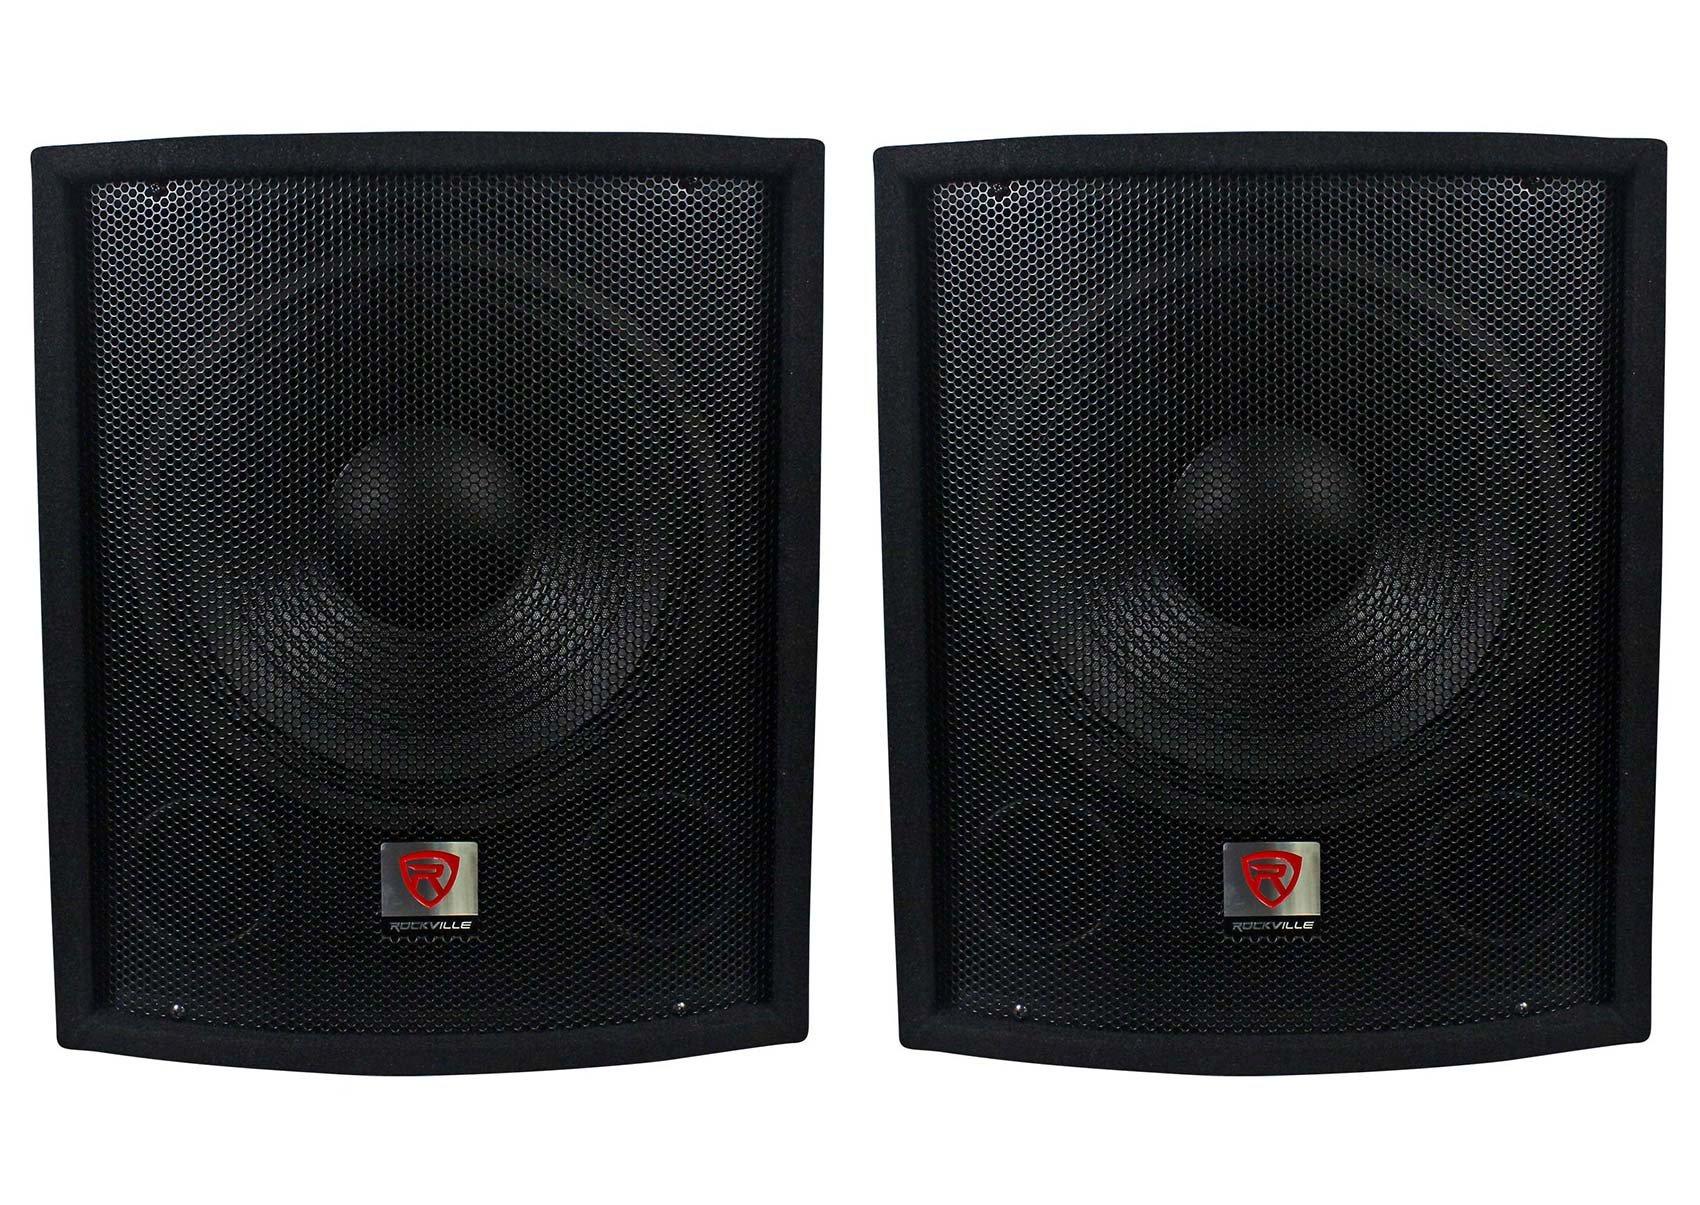 (2) New Rockville SBG1128 12'' 1200 Watt Passive Pro DJ Subwoofers Subs by Rockville